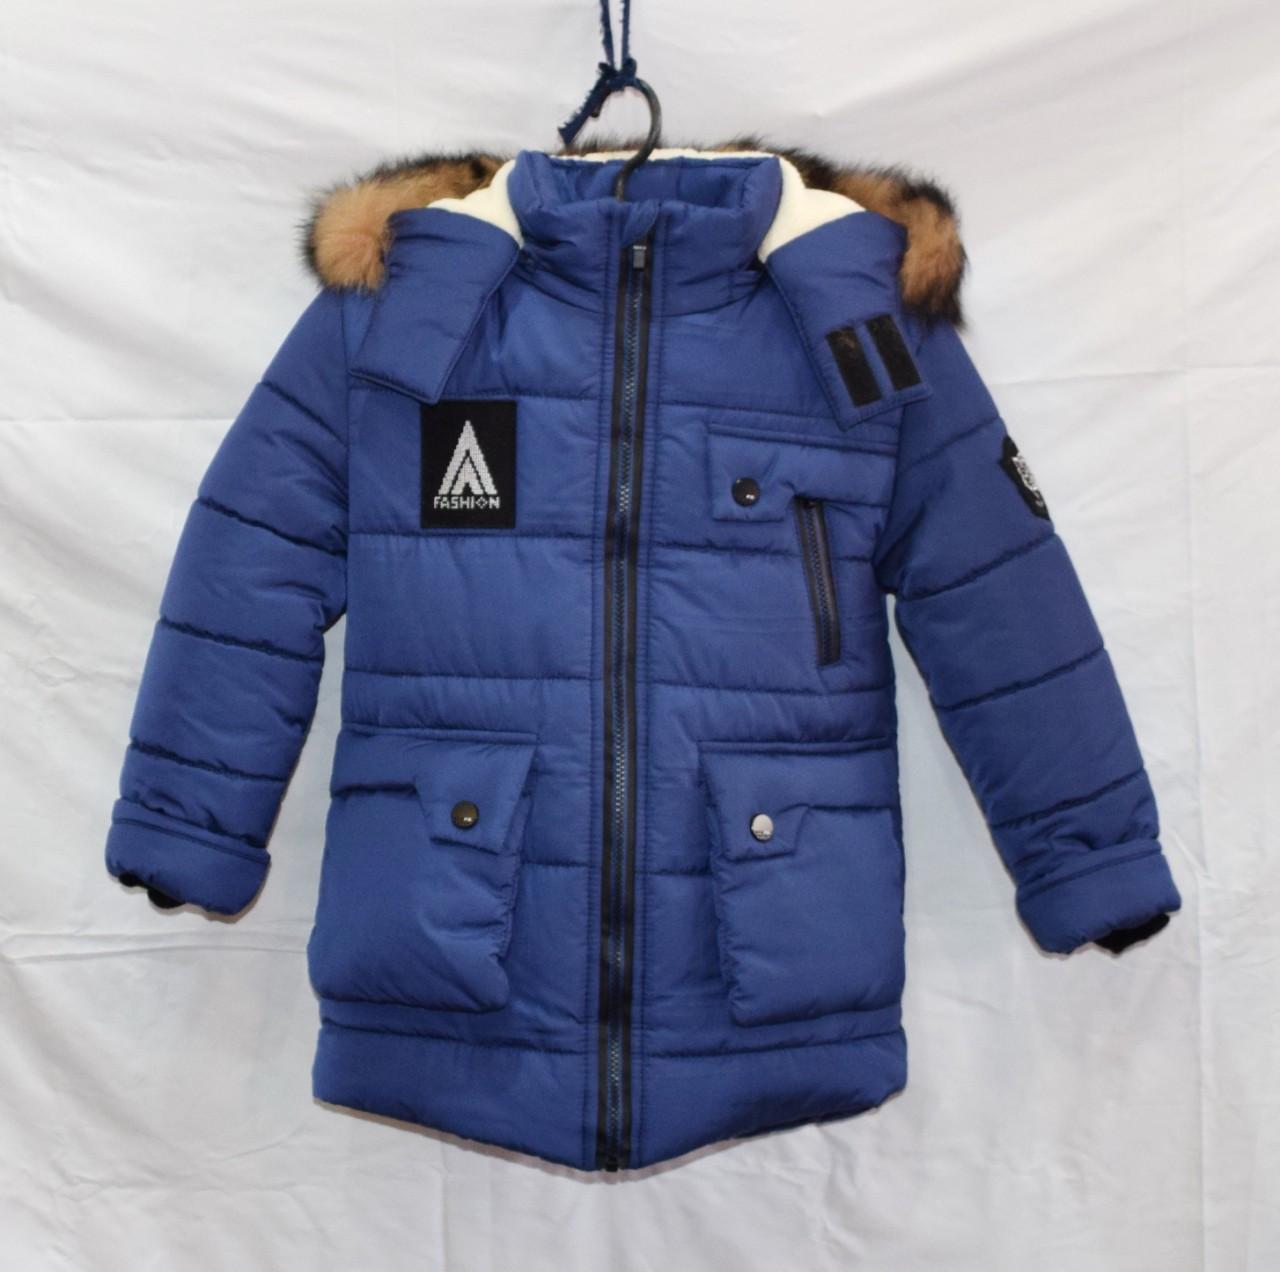 "Зимняя куртка - парка  ""Фэшн""  с натуральной опушкой, р-ры на рост 116 - 140"